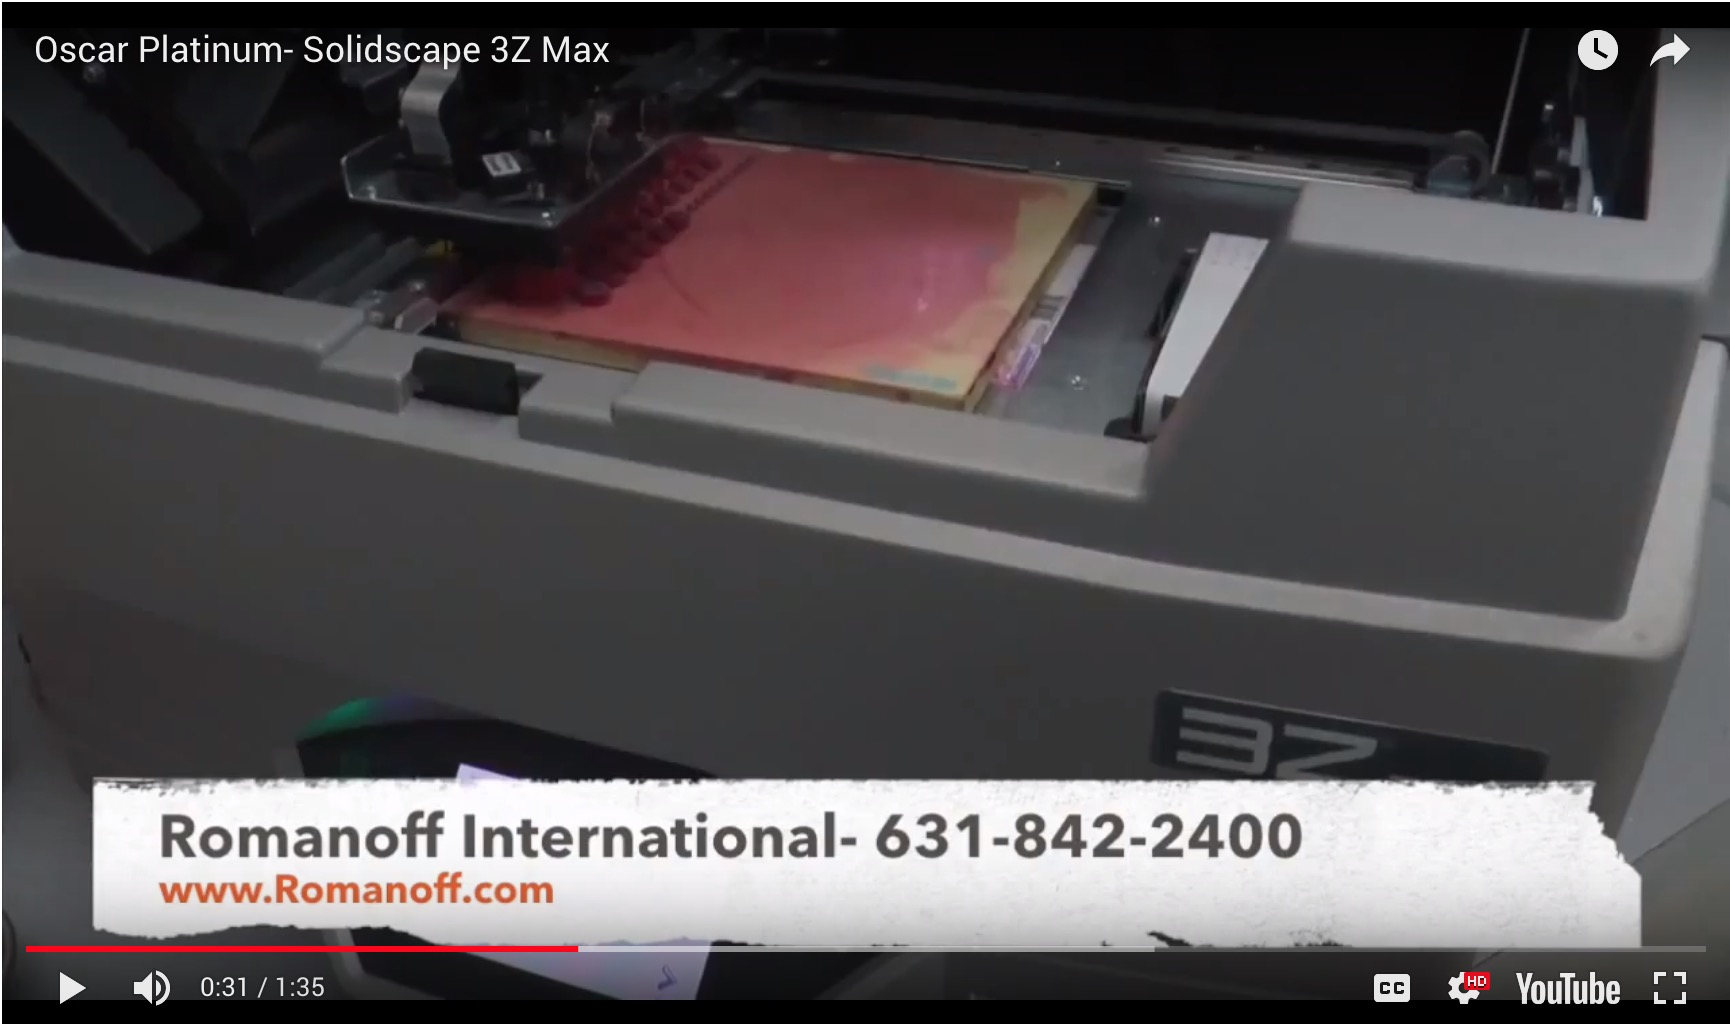 Oscar Platinum - Solidscape 3Z Max